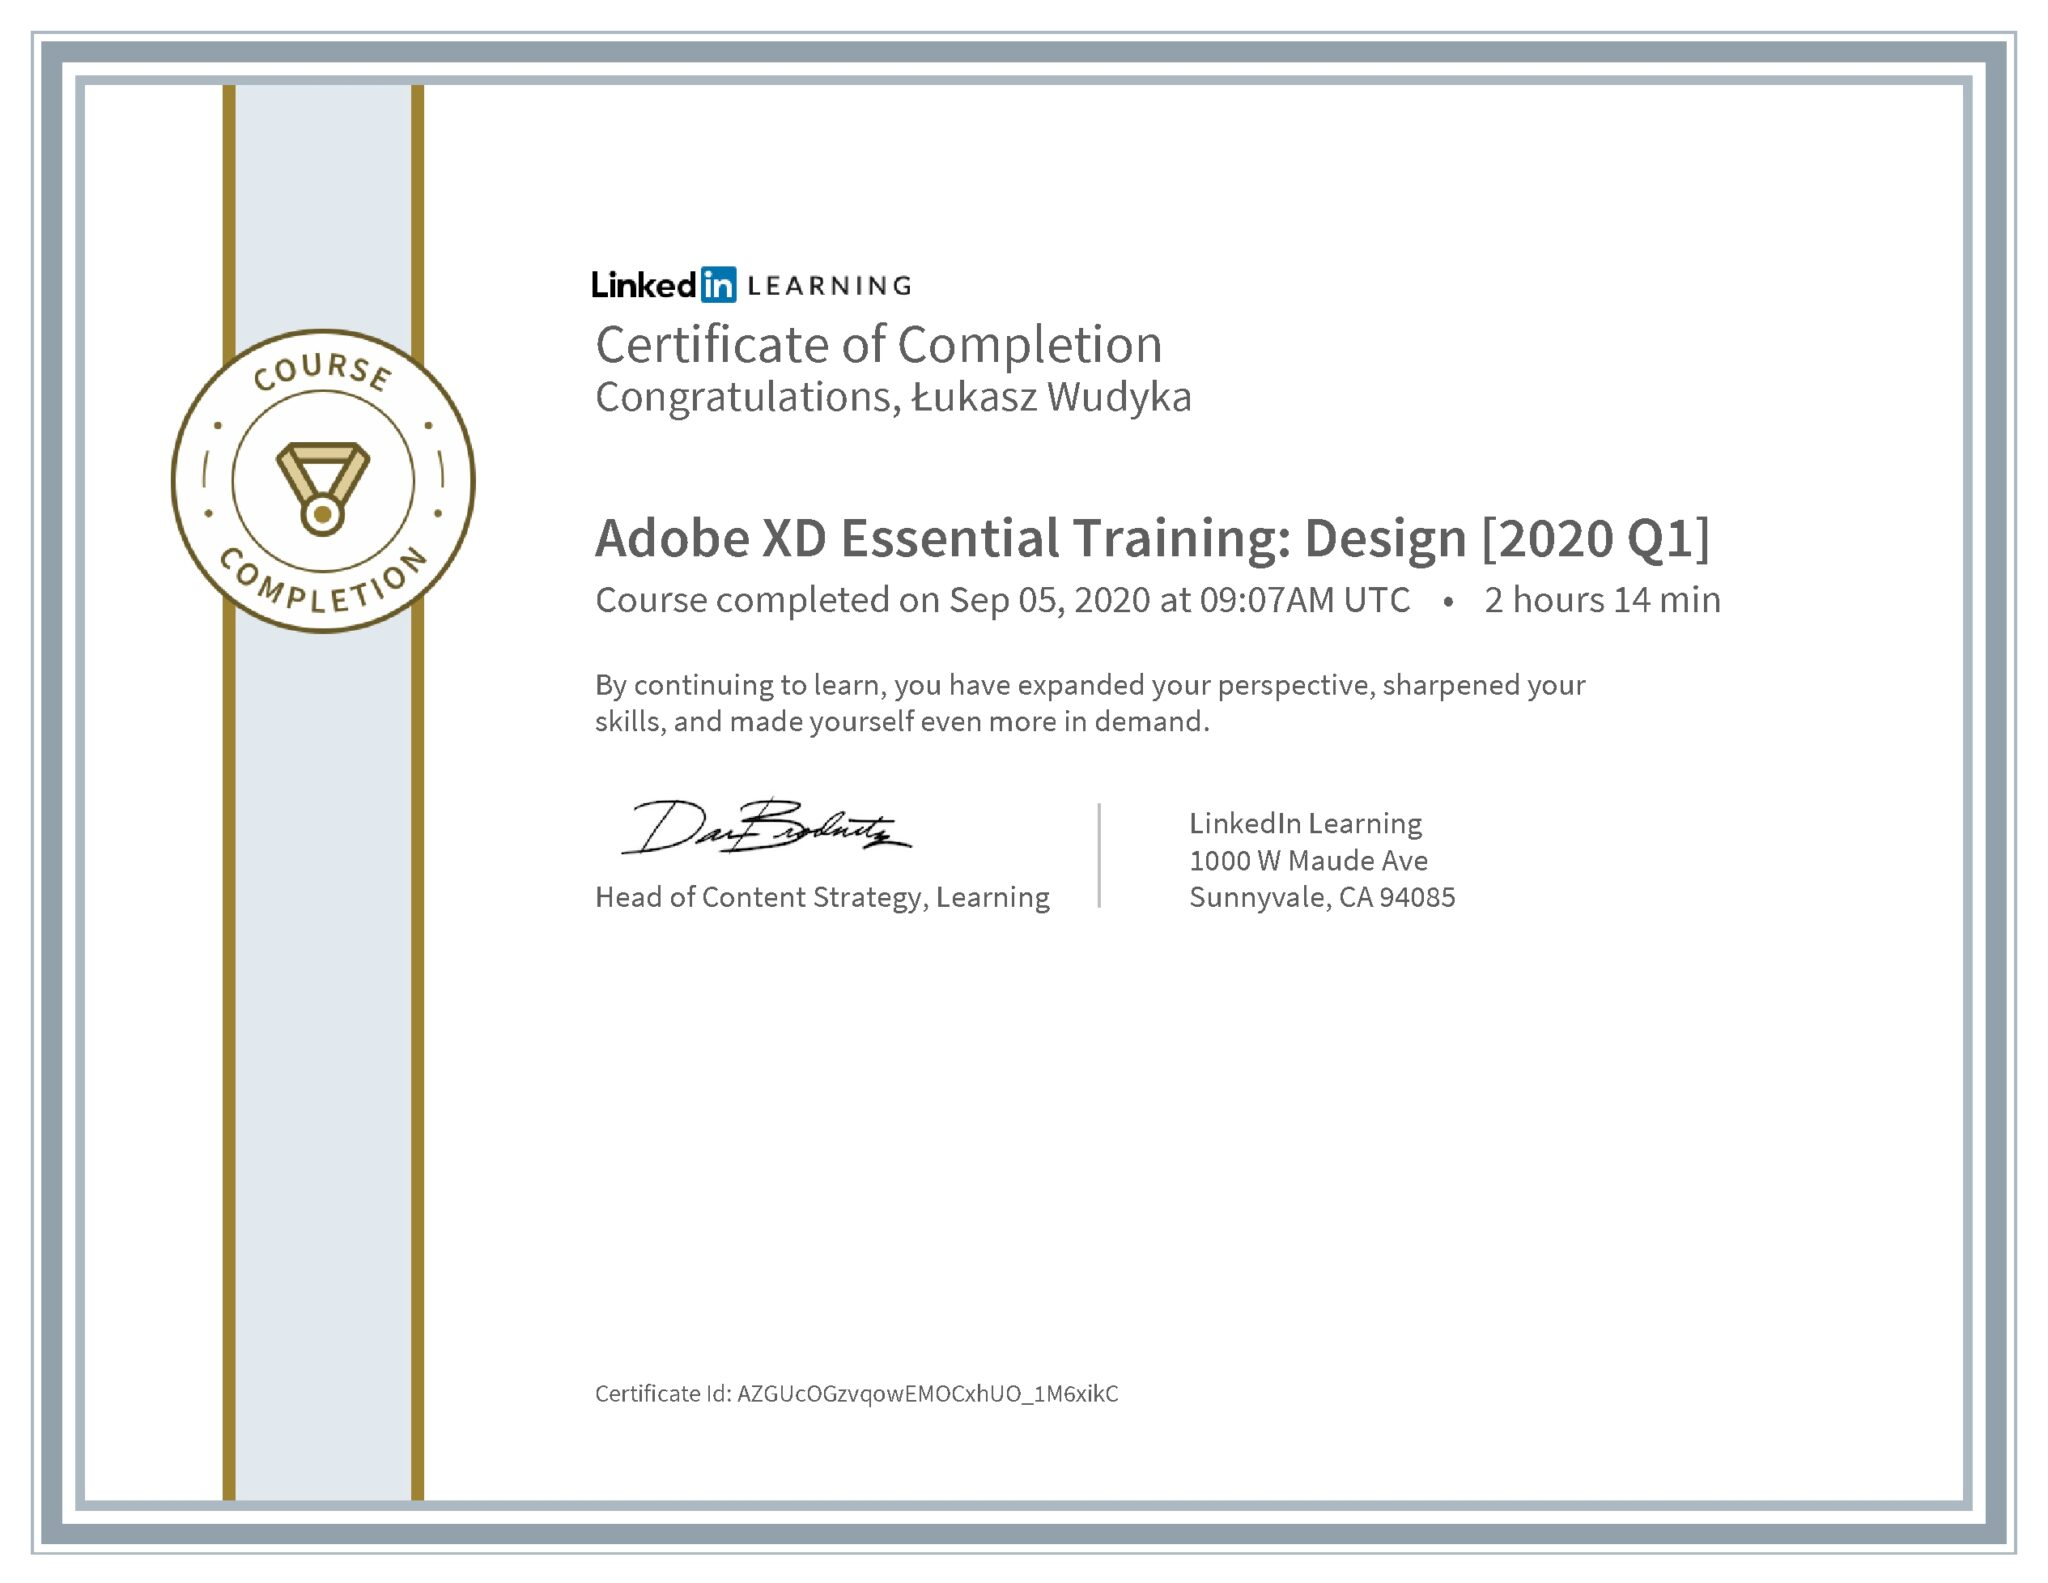 Łukasz Wudyka certyfikat LinkedIn Adobe XD Essential Training: Design [2020 Q1]